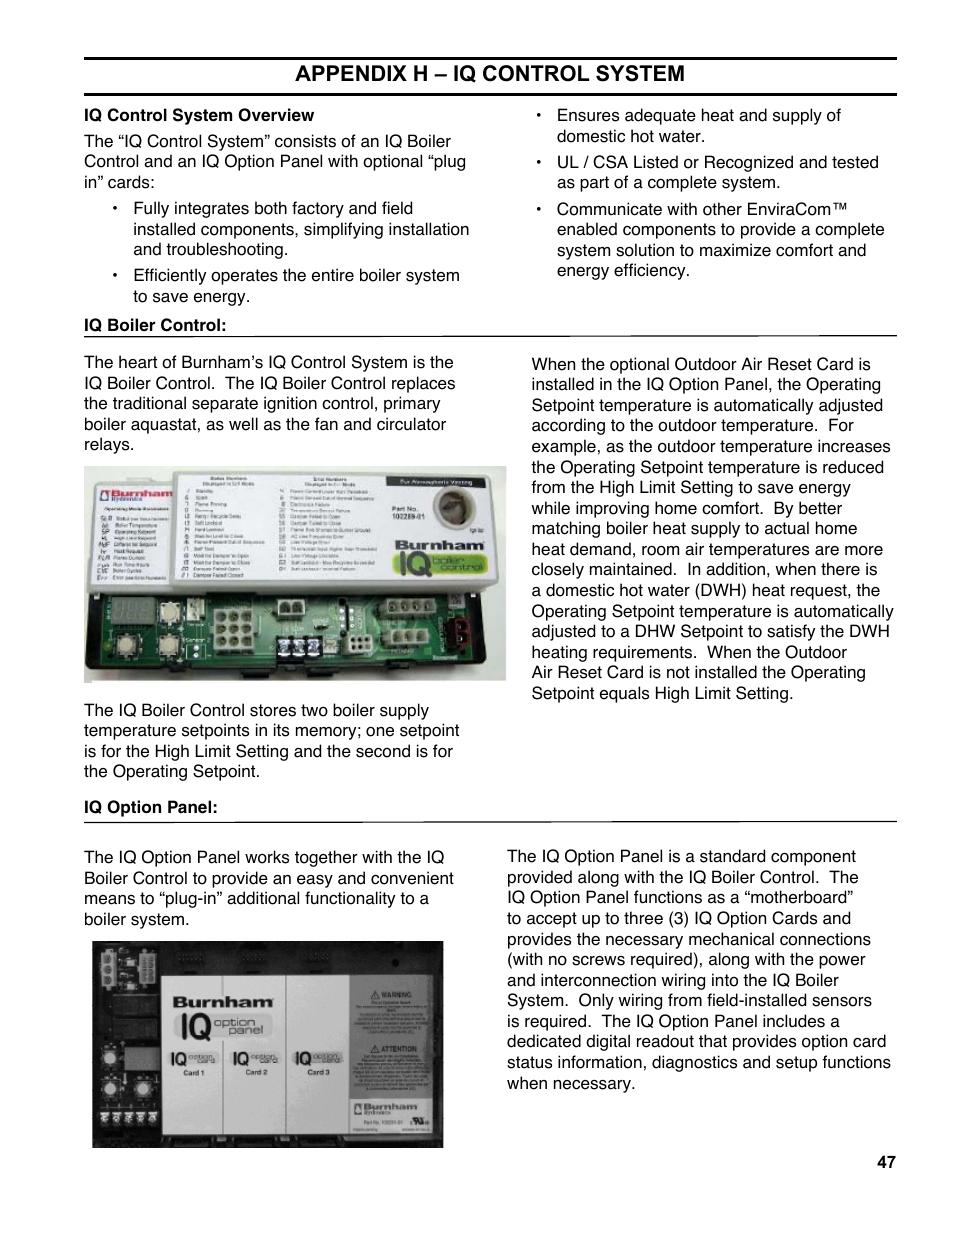 Burnham Es2 Manual Slant Fin Boiler Wiring Diagram Boilers Furnaces Hydronic Accessories Steam